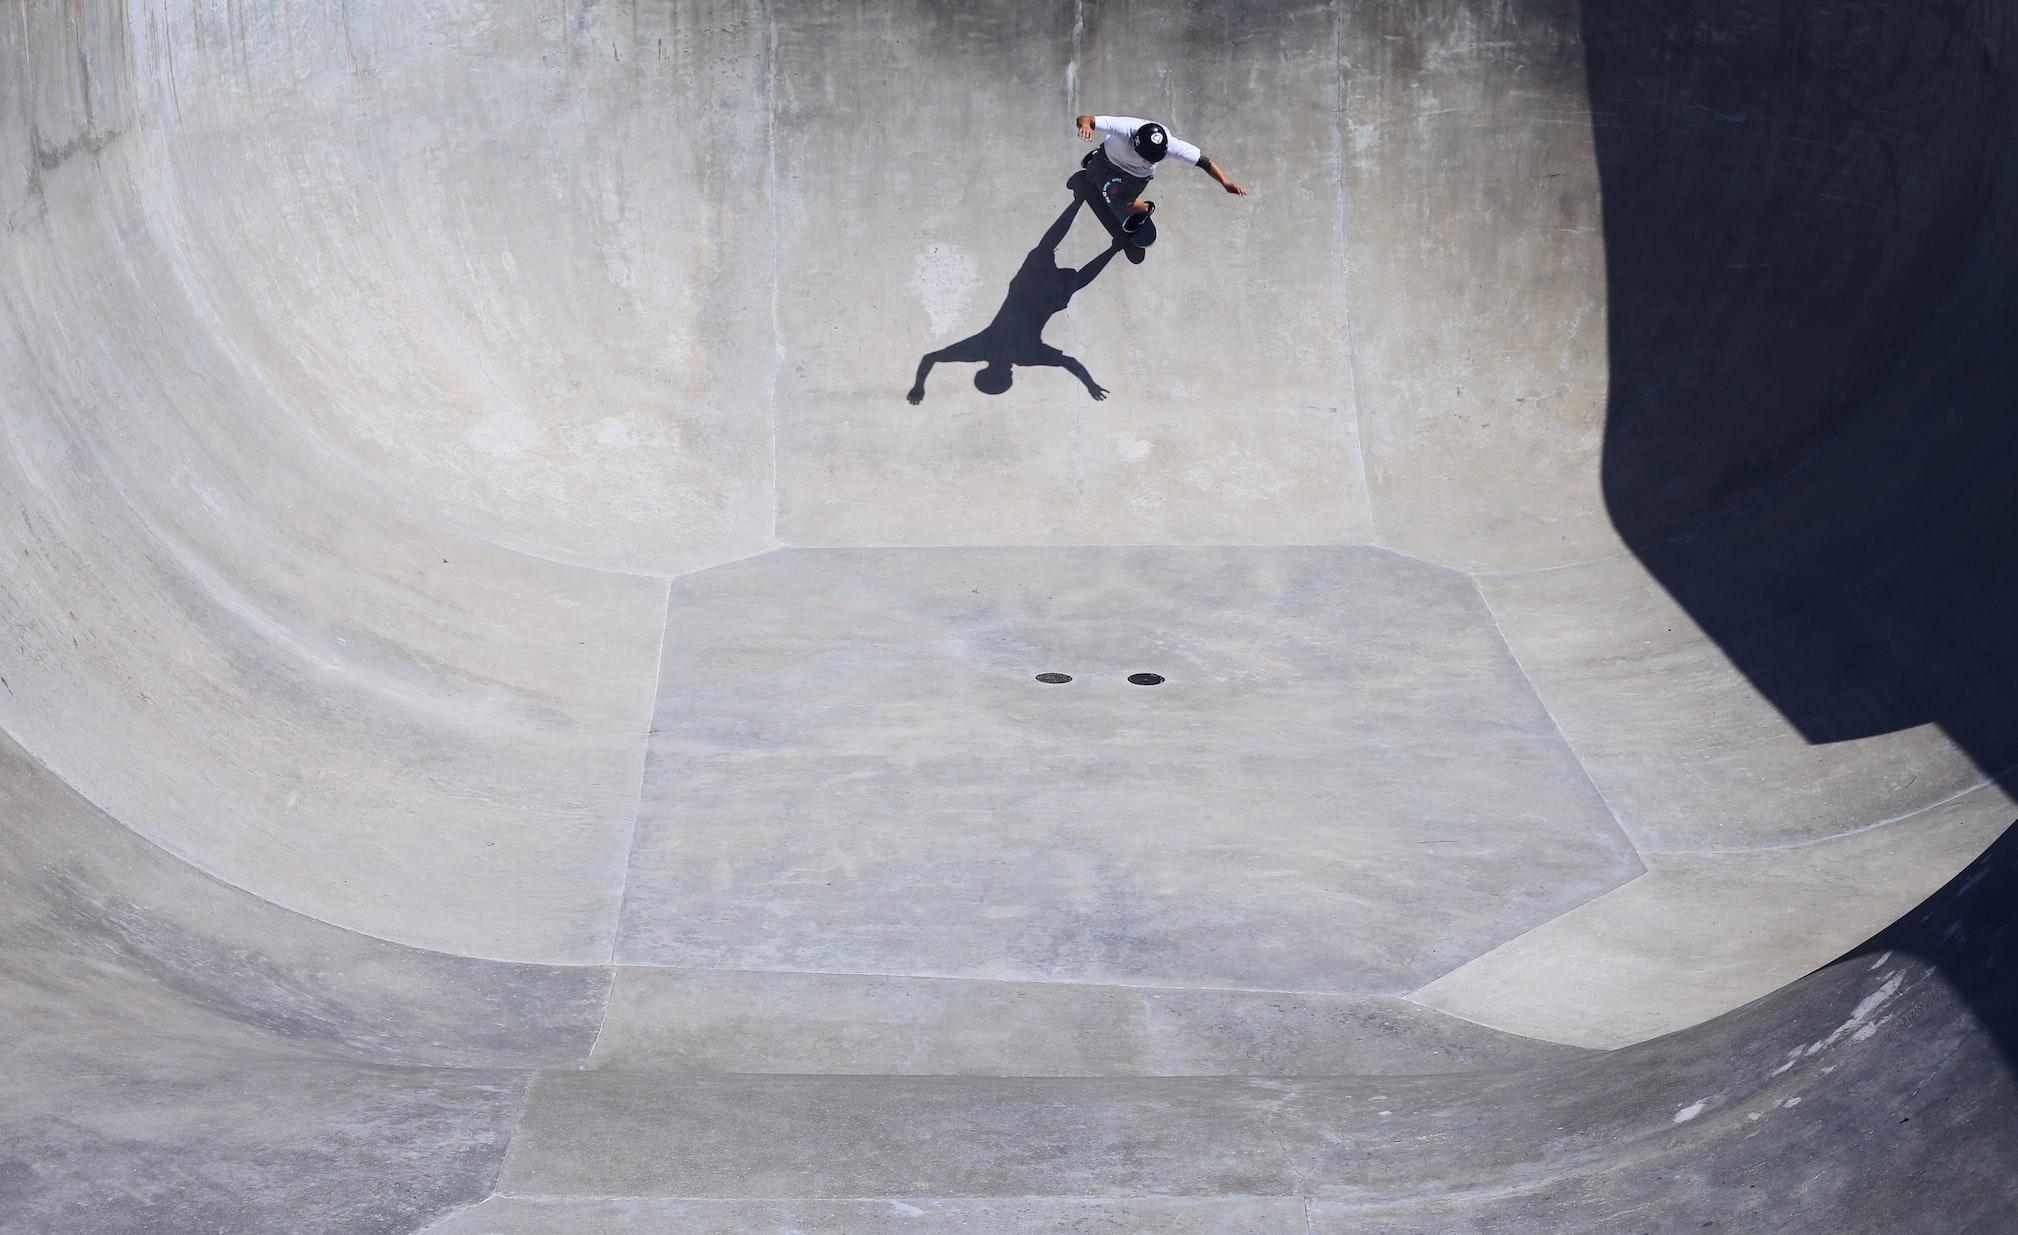 Skate Park - things to do Houston